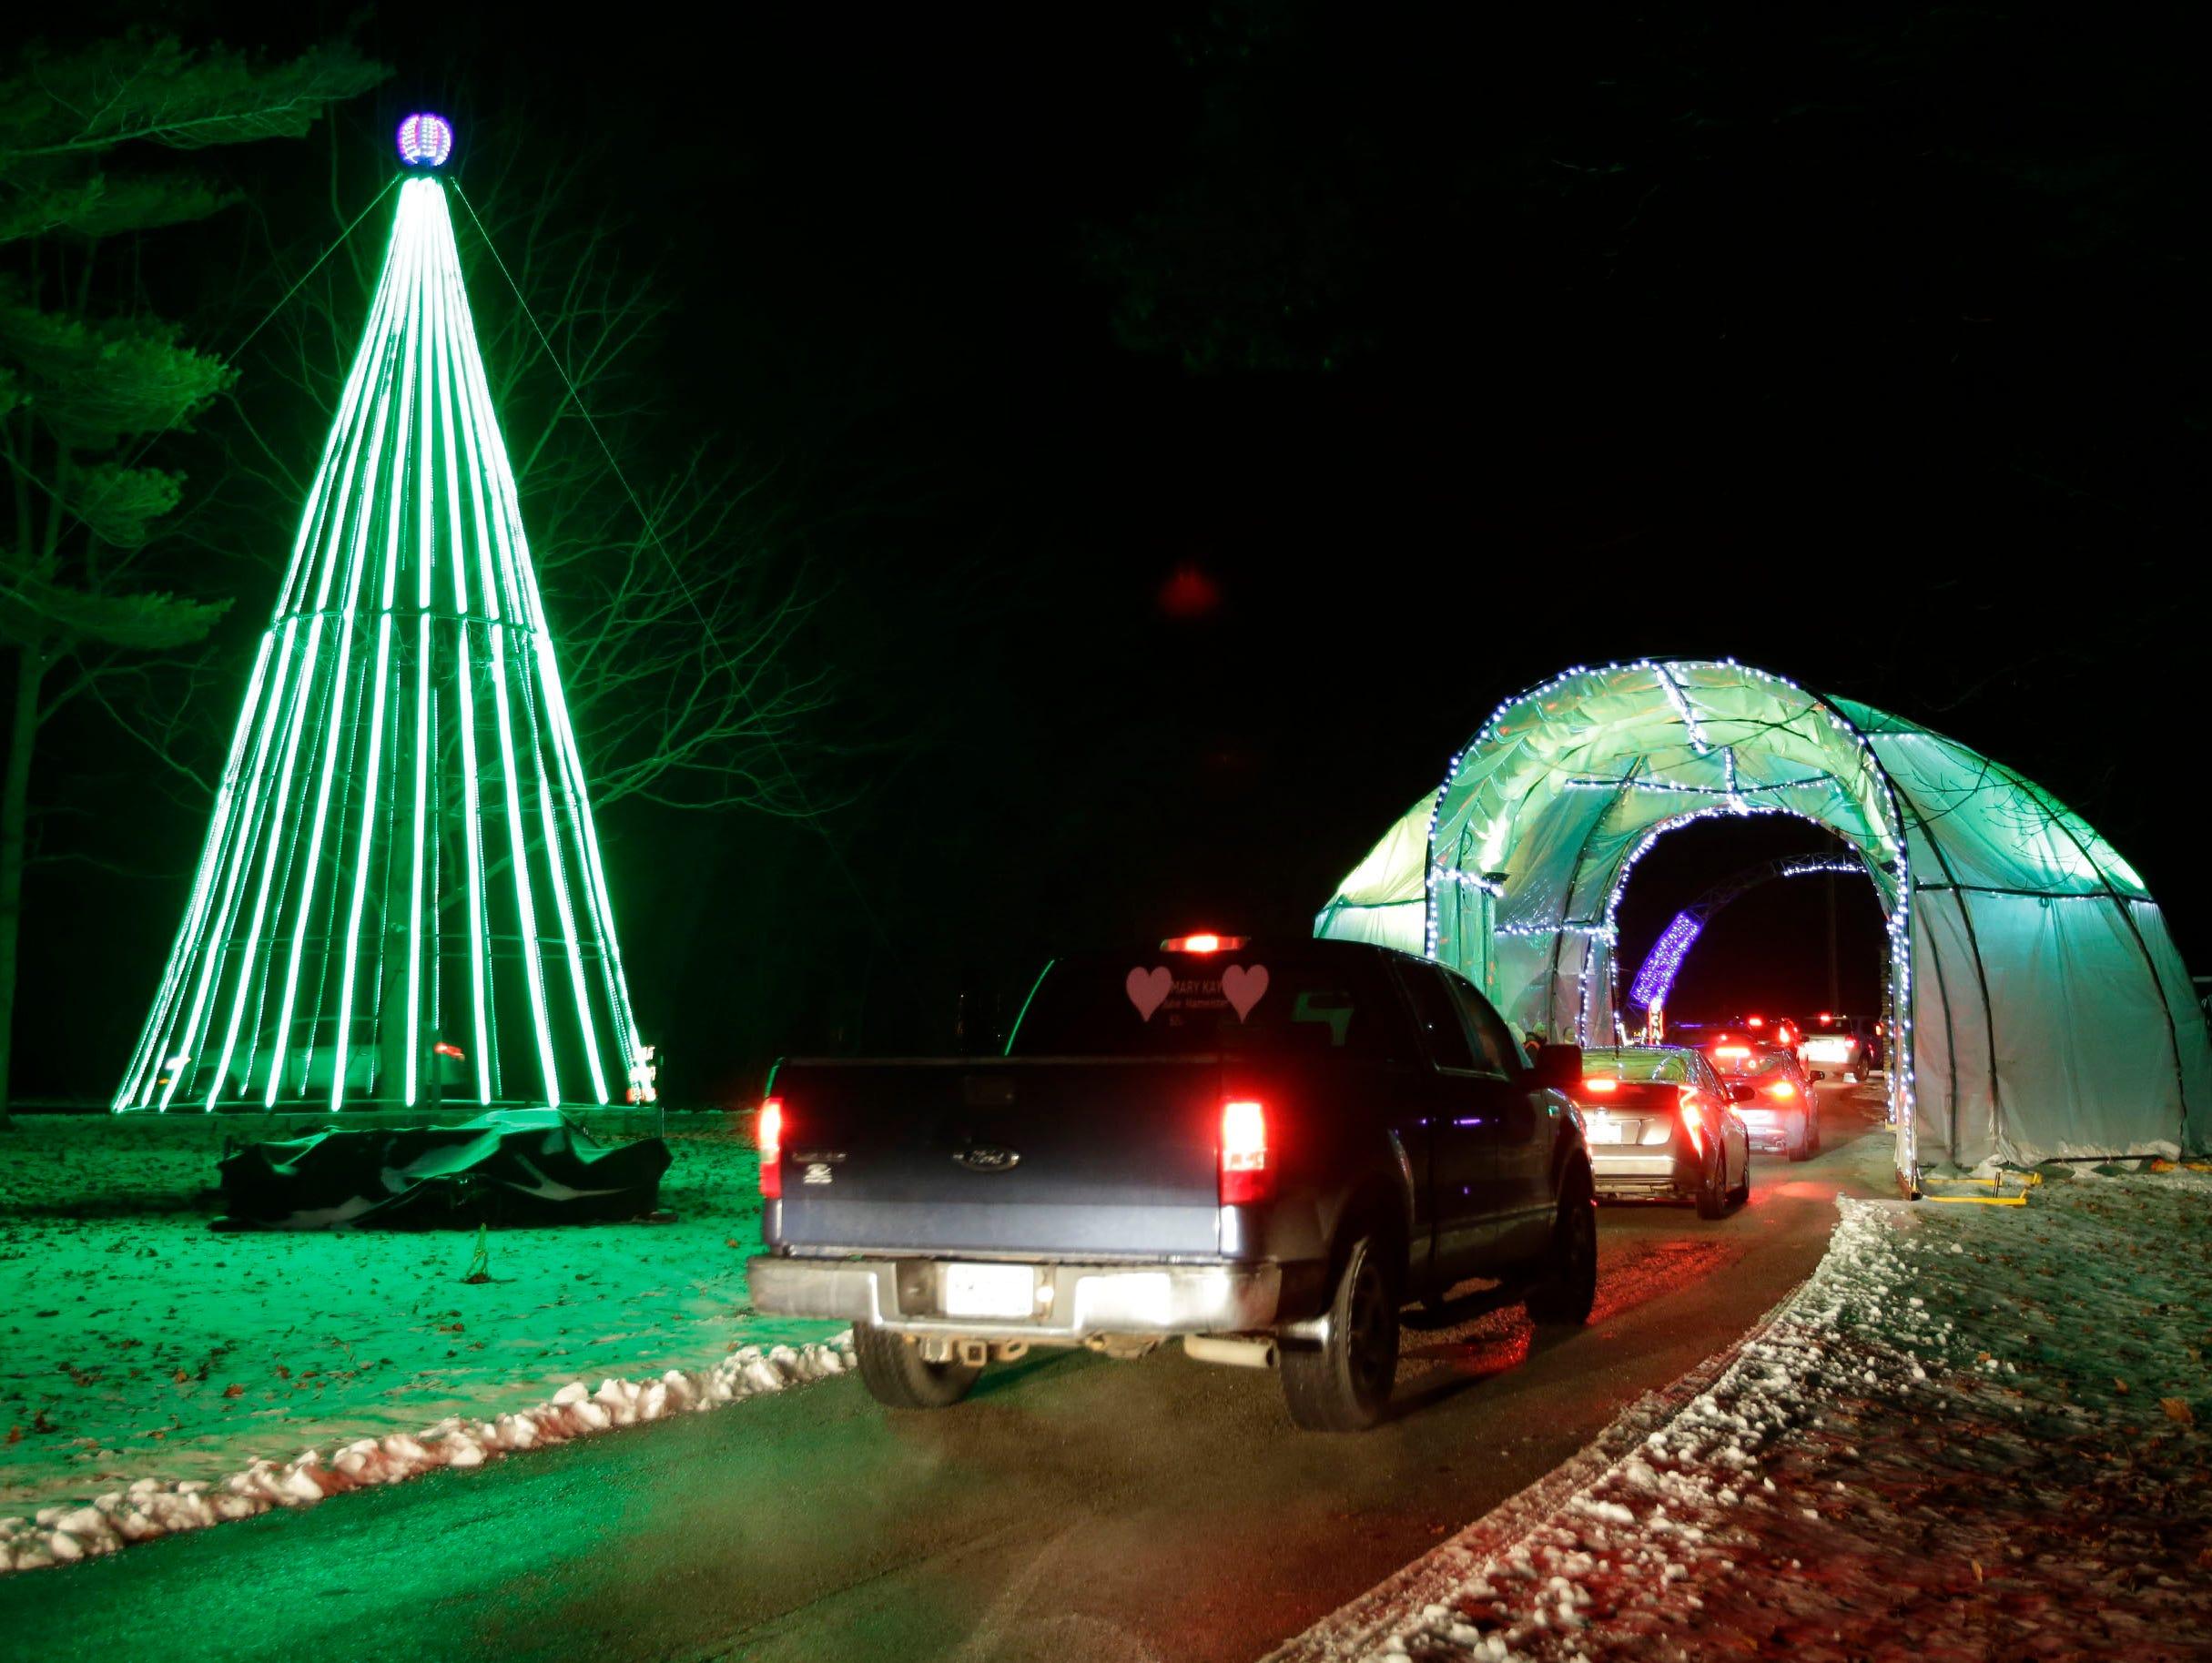 Vehicles exit Making Spirits Bright at Evergreen Park, Friday, November 30, 2018, in Sheboygan, Wis.